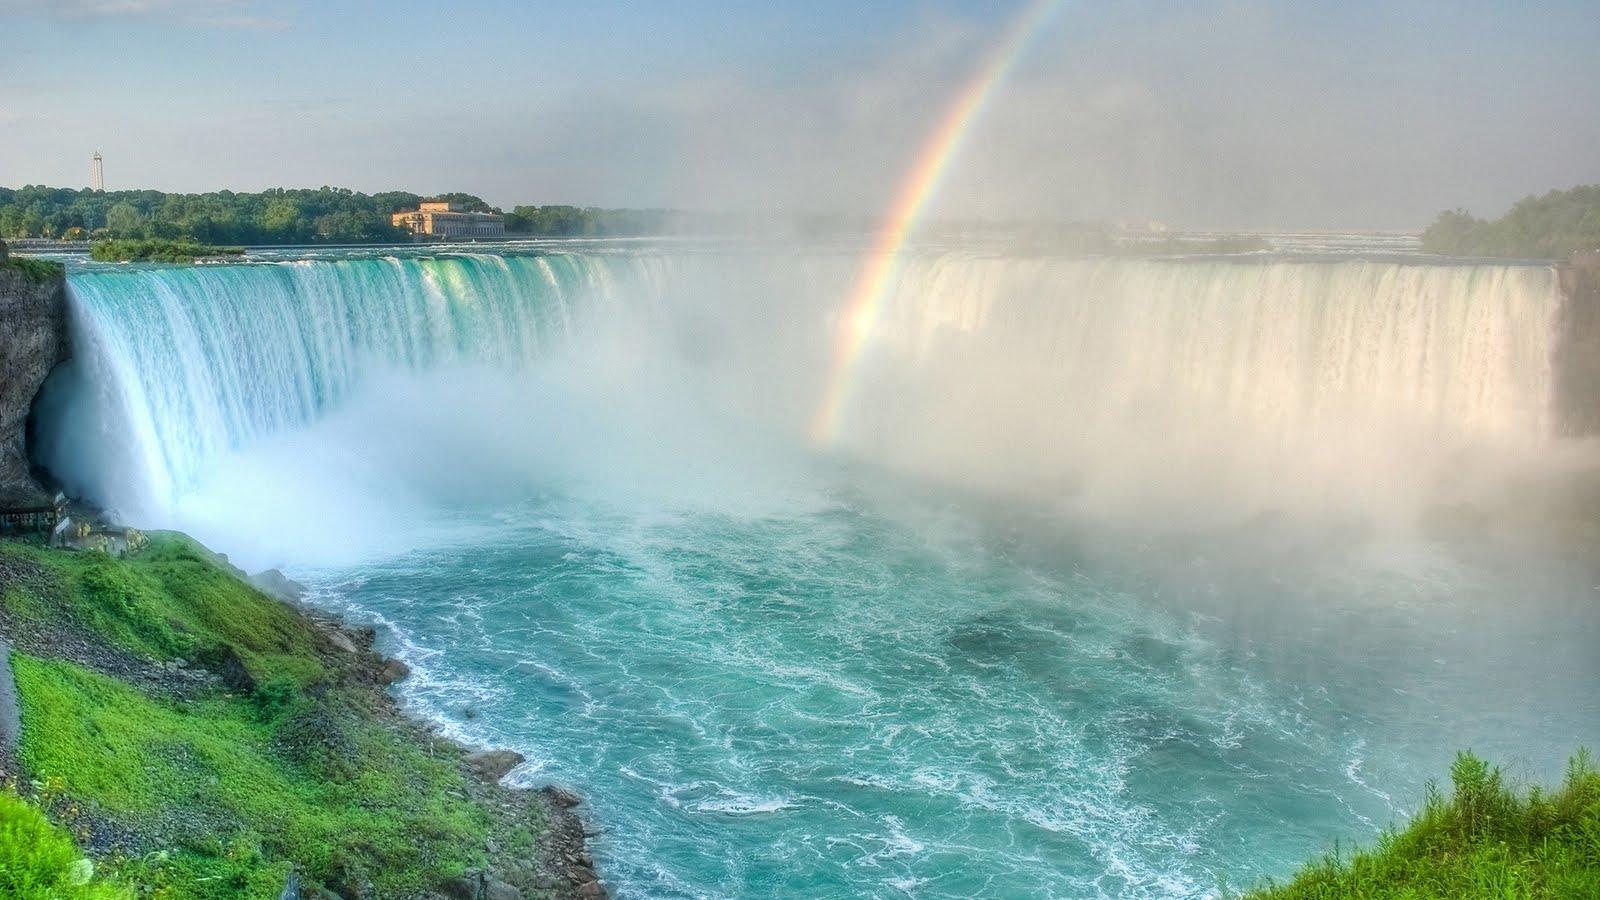 Regenboog achtergronden hd wallpapers - Beauti ful carteans pic hd ...